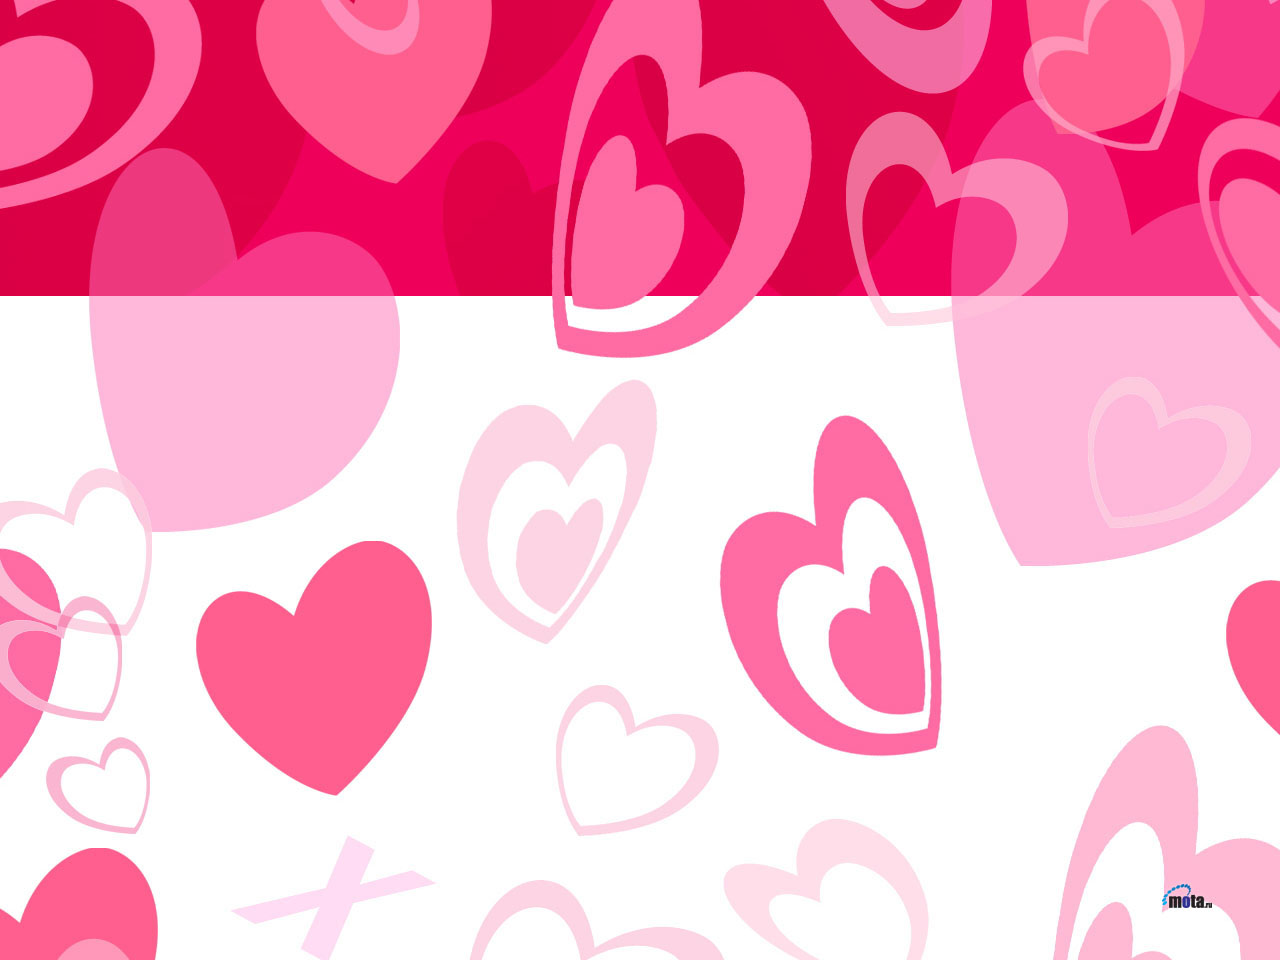 47 wallpaper san valentin on wallpapersafari - San valentin desktop backgrounds ...